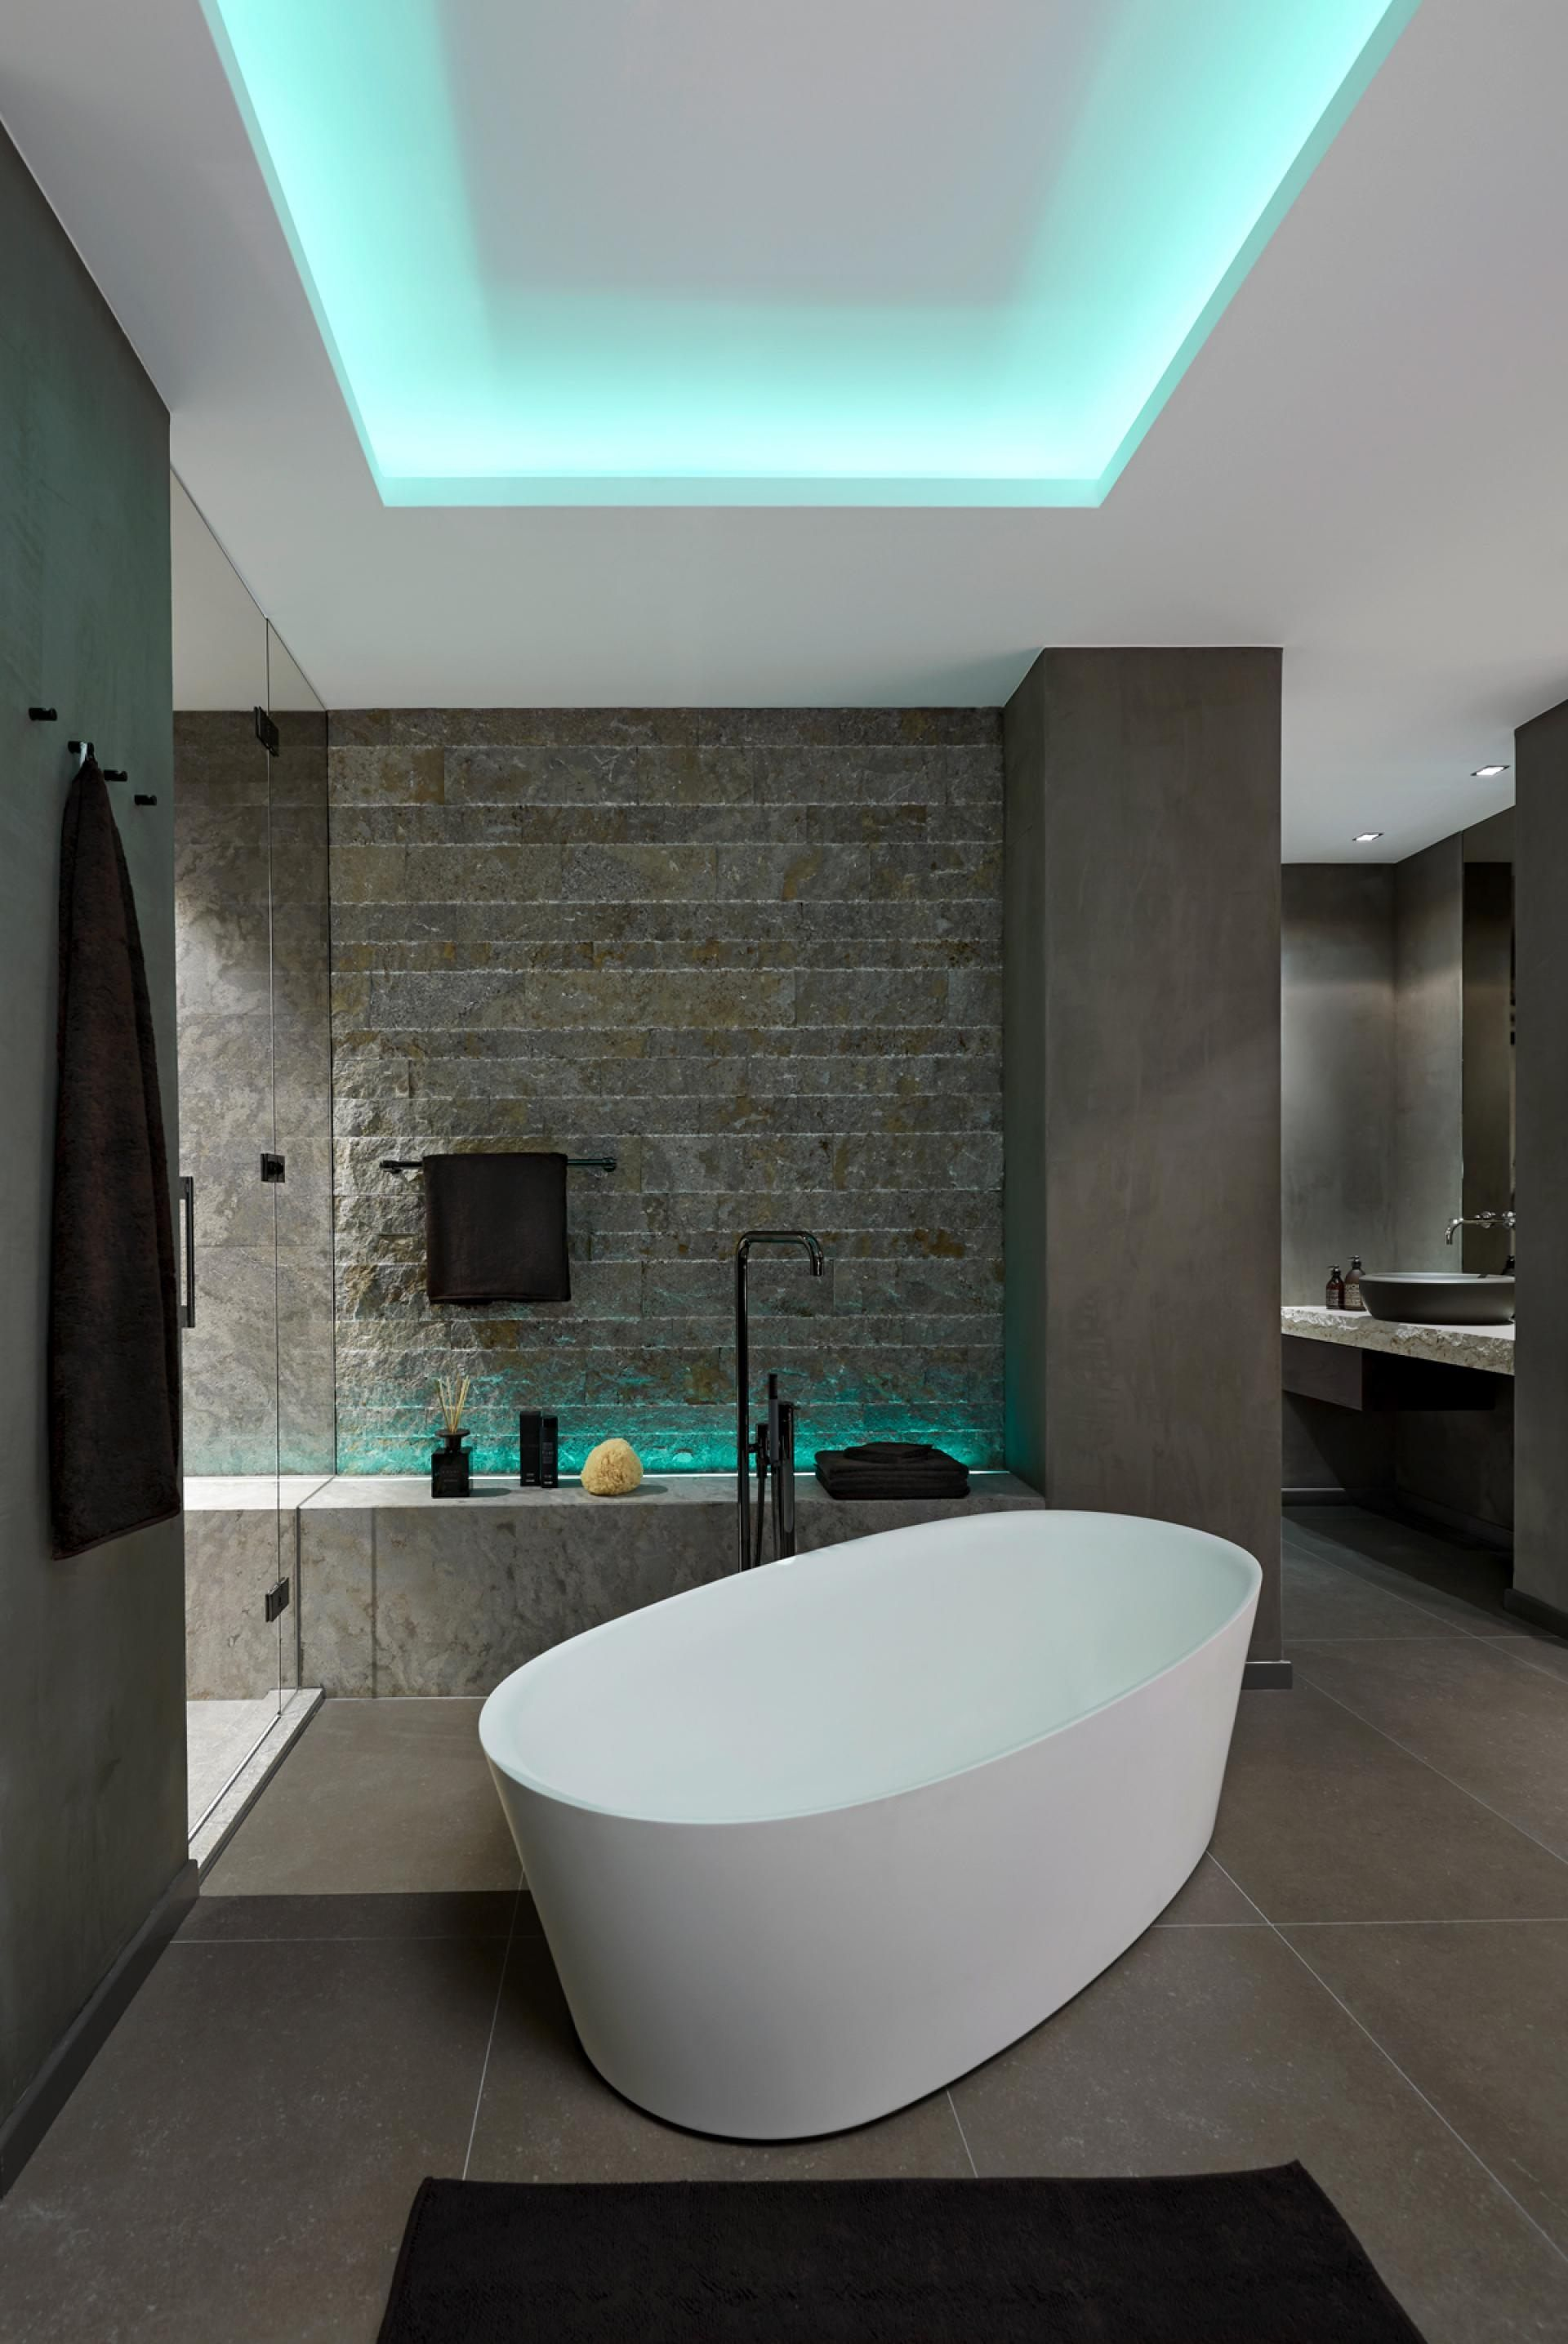 5 Gasteiger Bad Kitzbuhel Moderne Badgestaltung Exklusiv Eintagamsee Badgestaltung Bad Design Badewanne